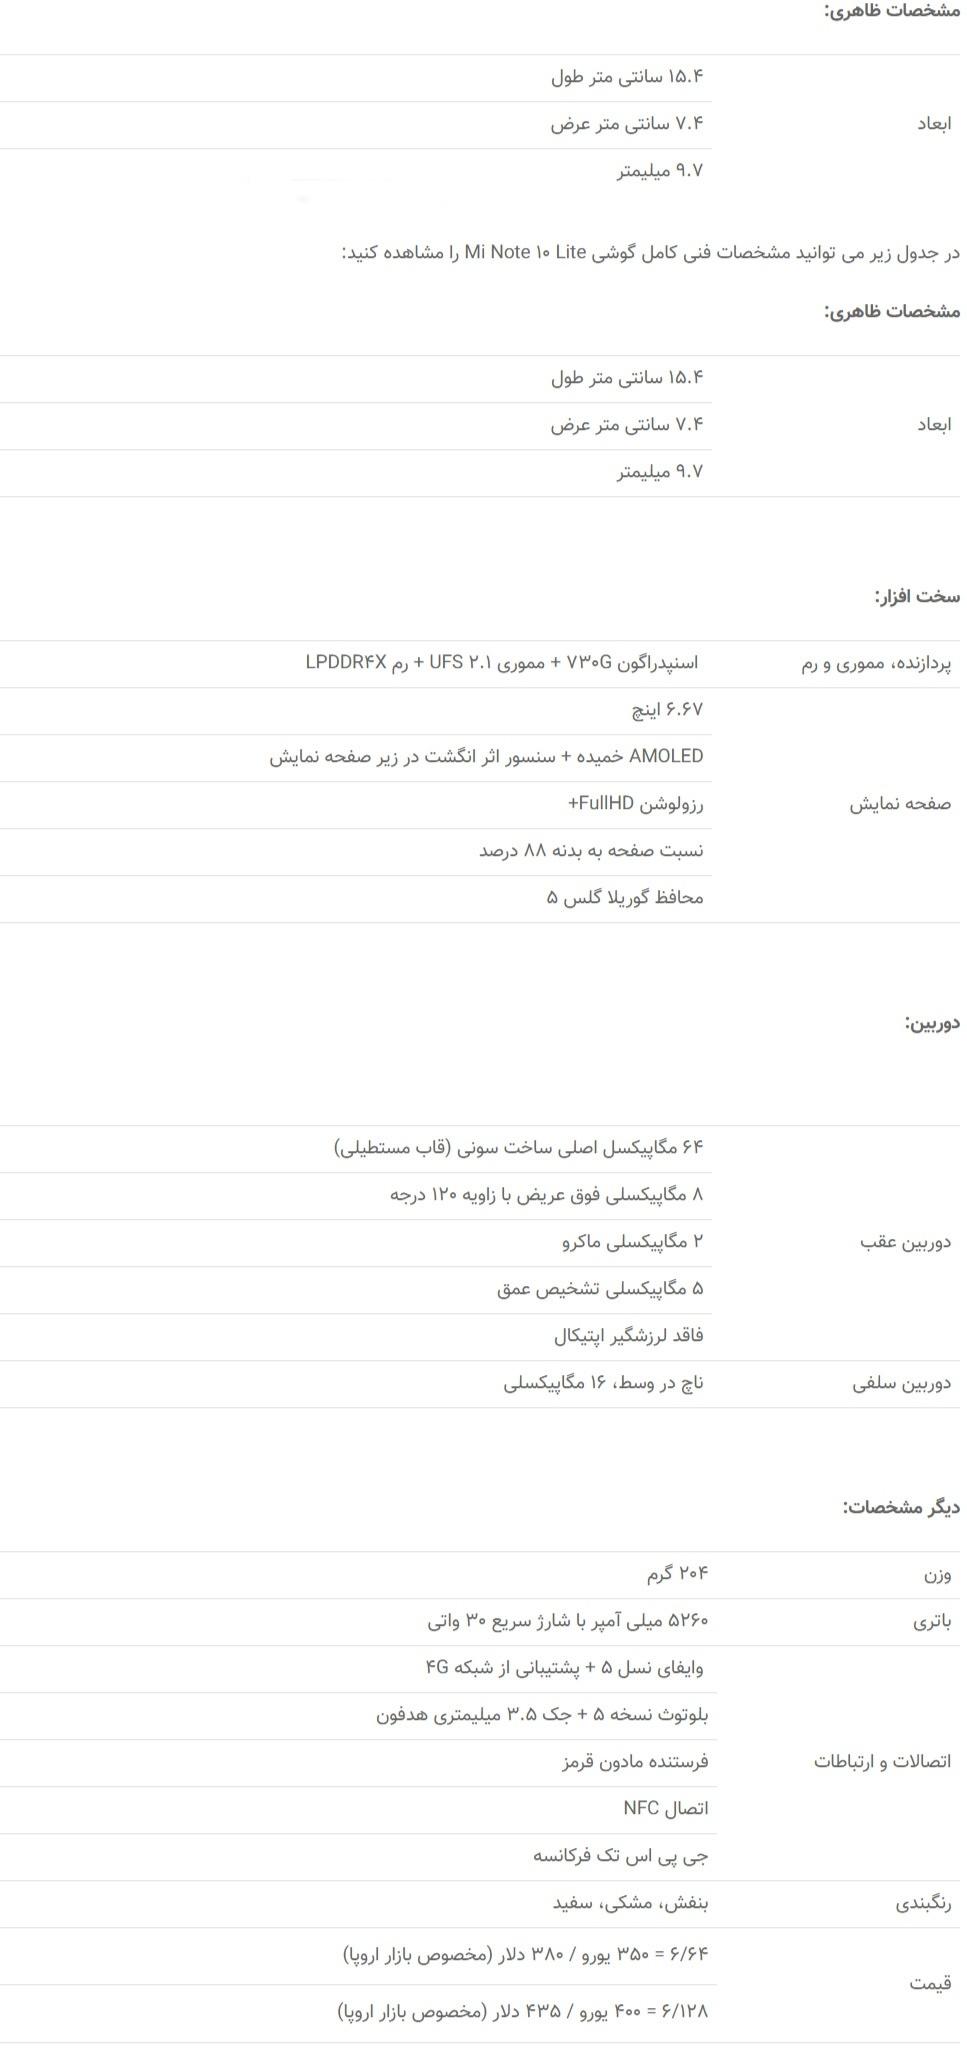 screencapture-xiaomi-mag-ir-articles-news-2088-mi-note-10-lite-2020-05-01-10_46_56